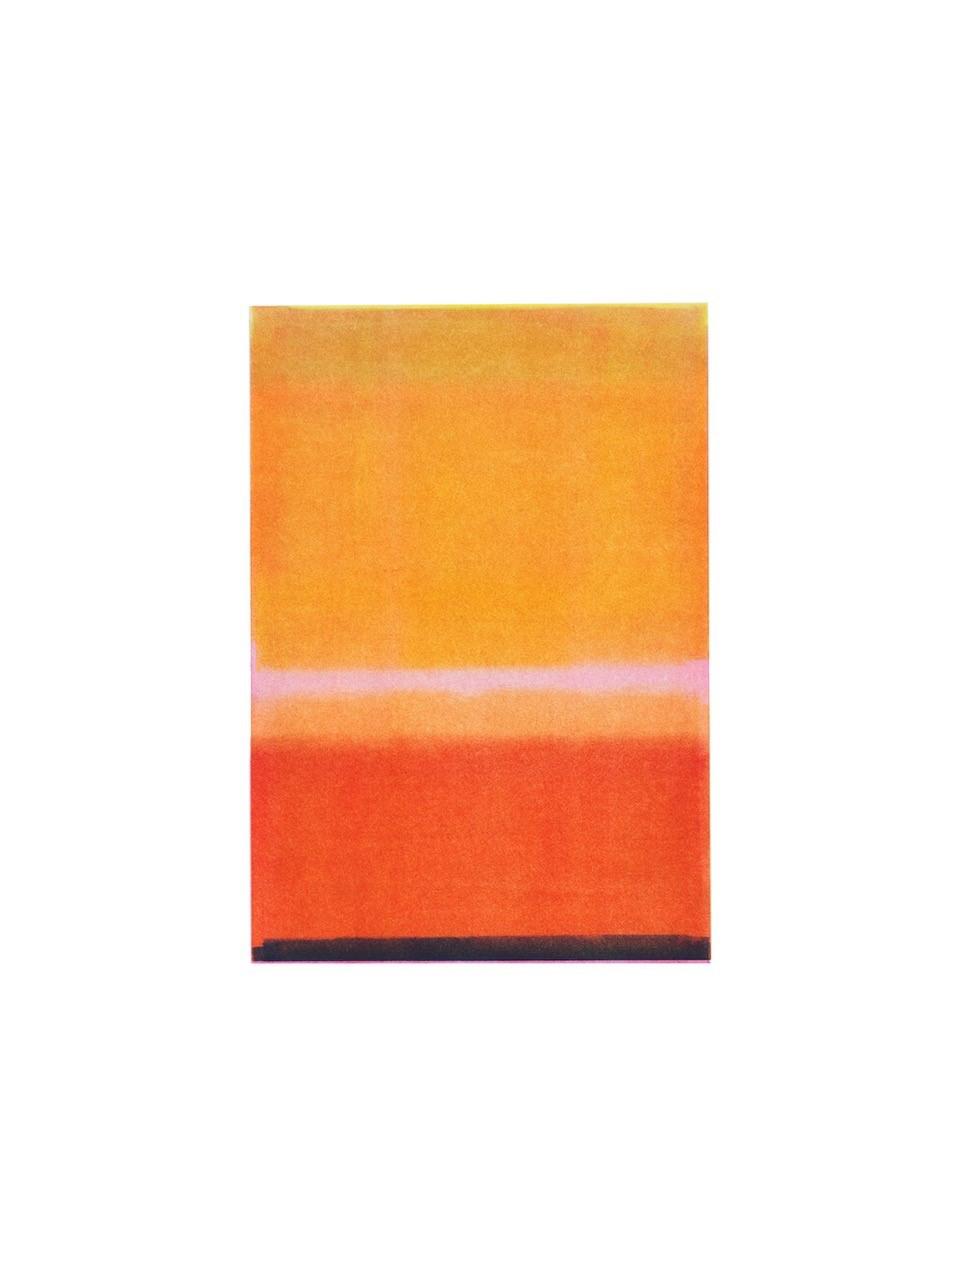 Diary XVII - Pigment print by Håkan Berg.